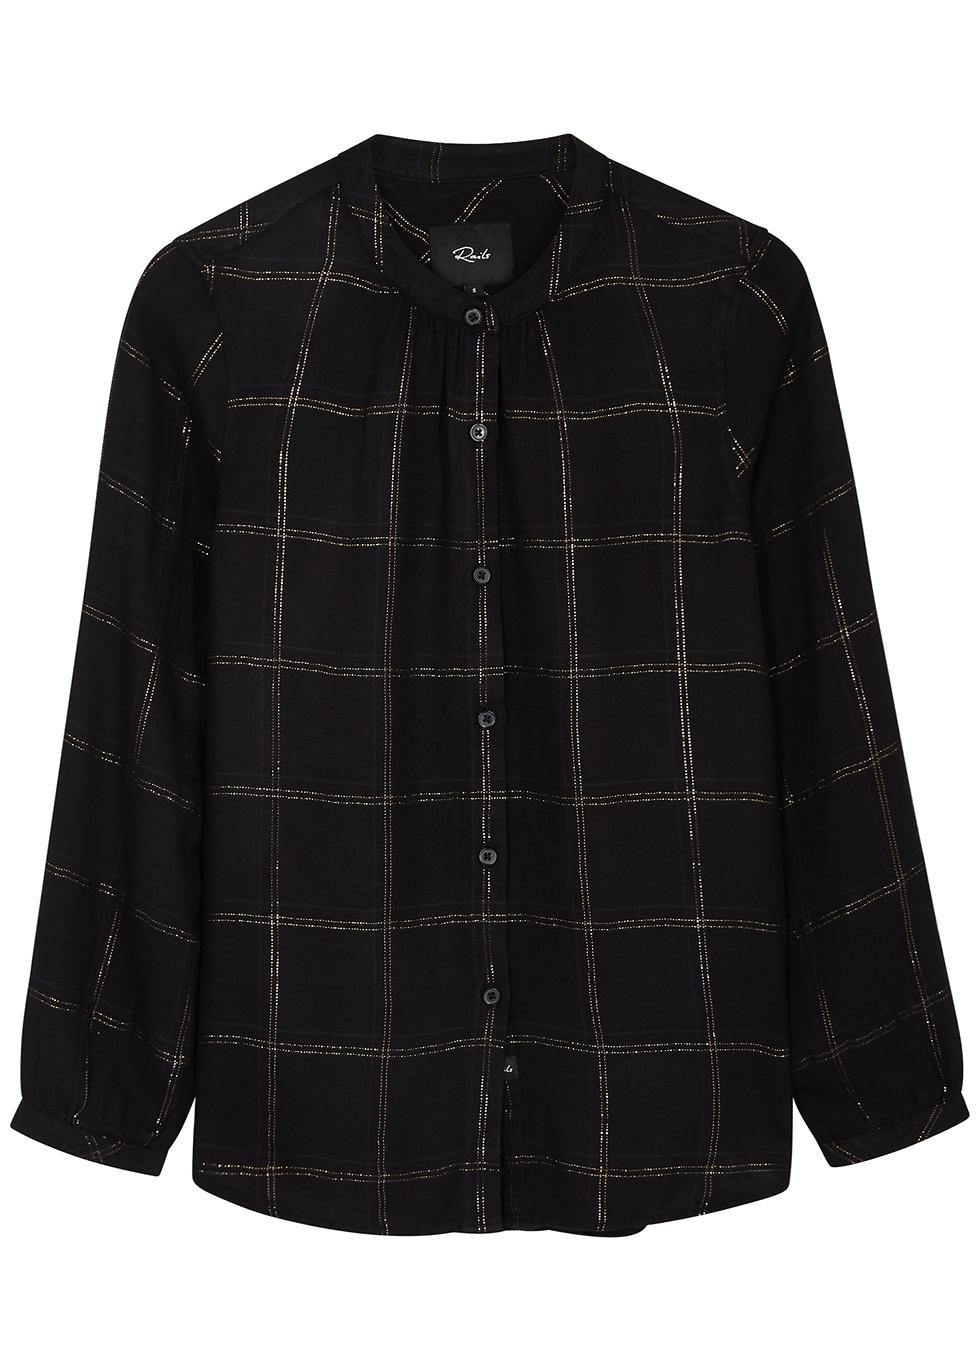 Eloise black checked shirt